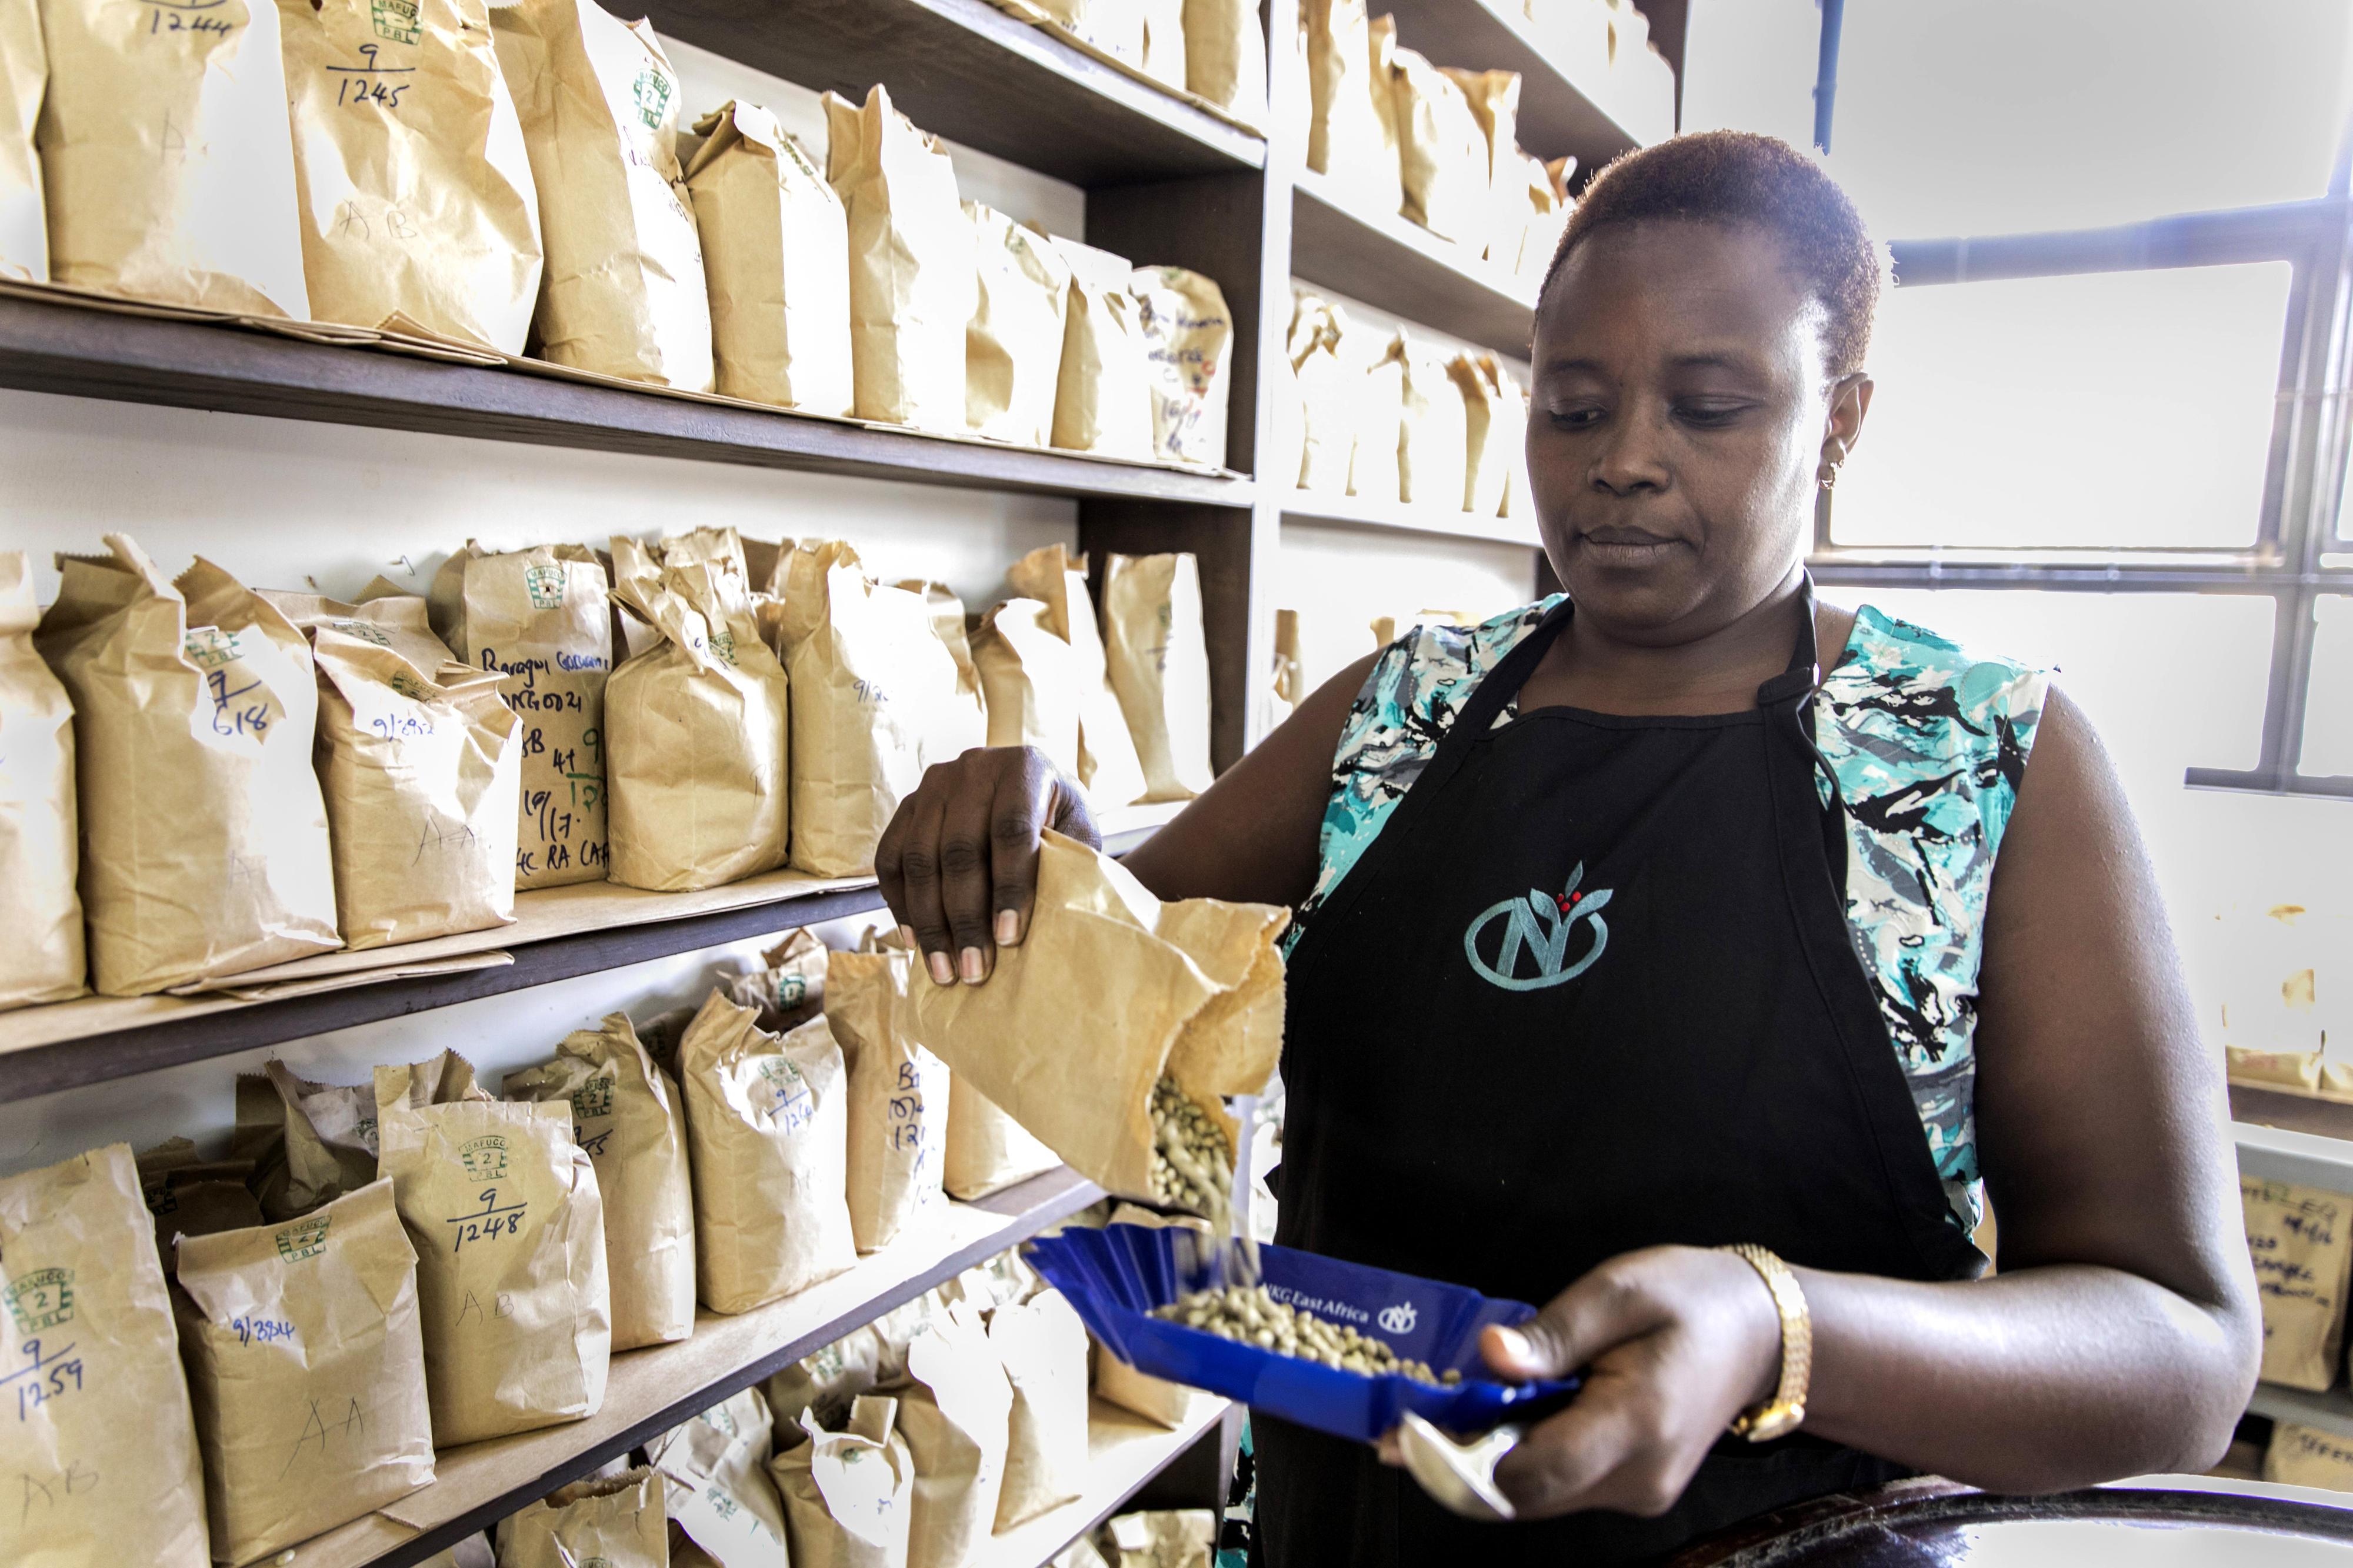 Verkosterin in einer Kaffeerösterei in Kenia